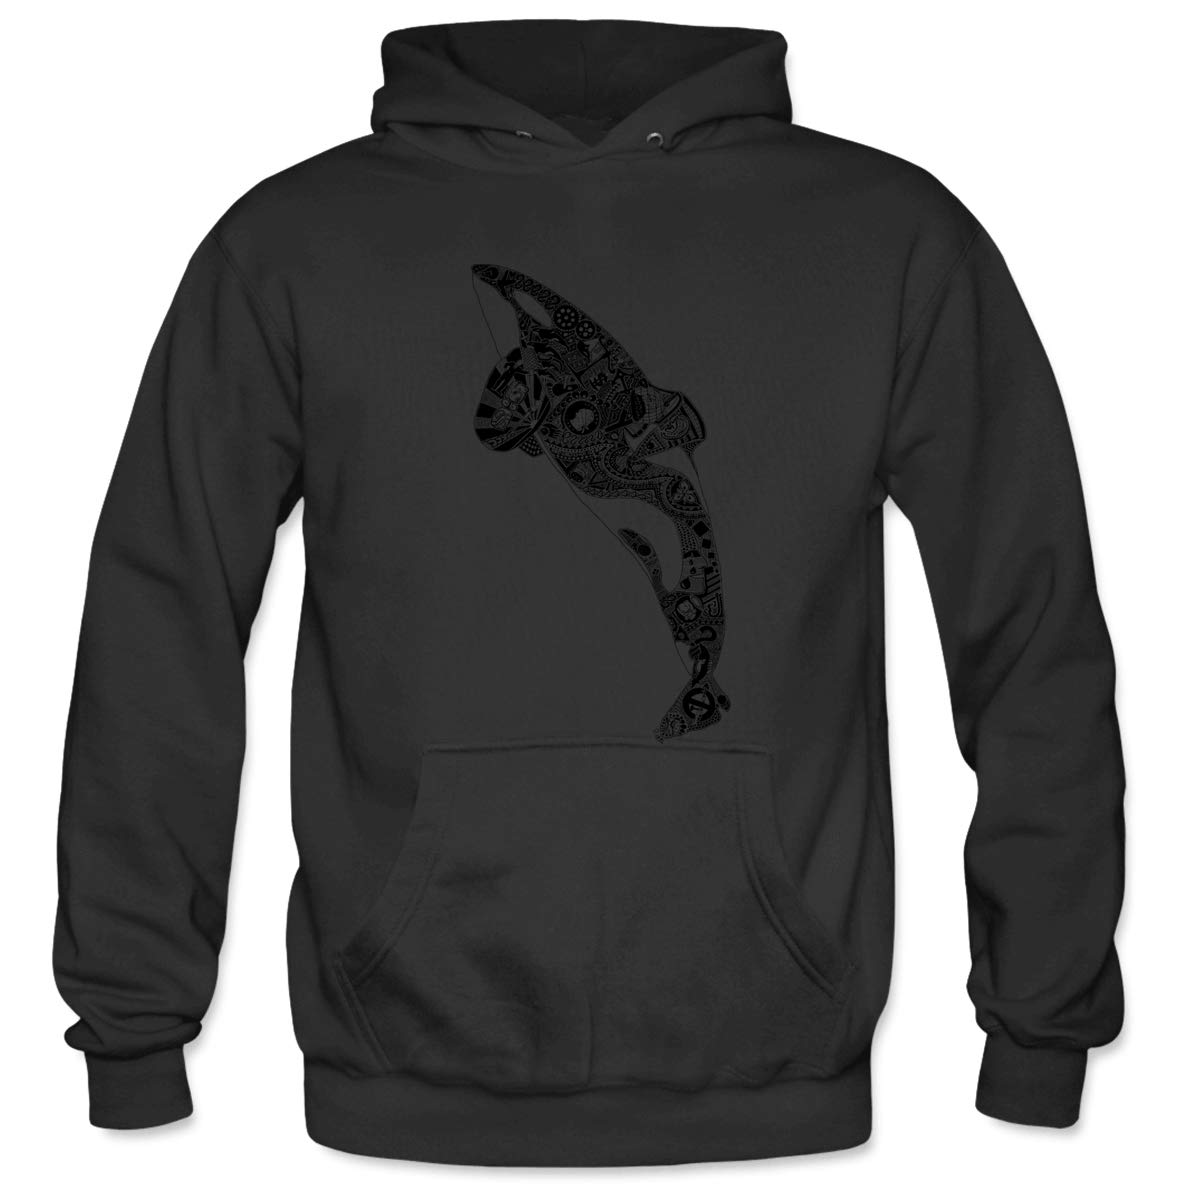 Mens Captivity Kills Hooded Sweatshirt Funny Printed Pullover Hoodies Classic Long Sleeve T Shirt Tops